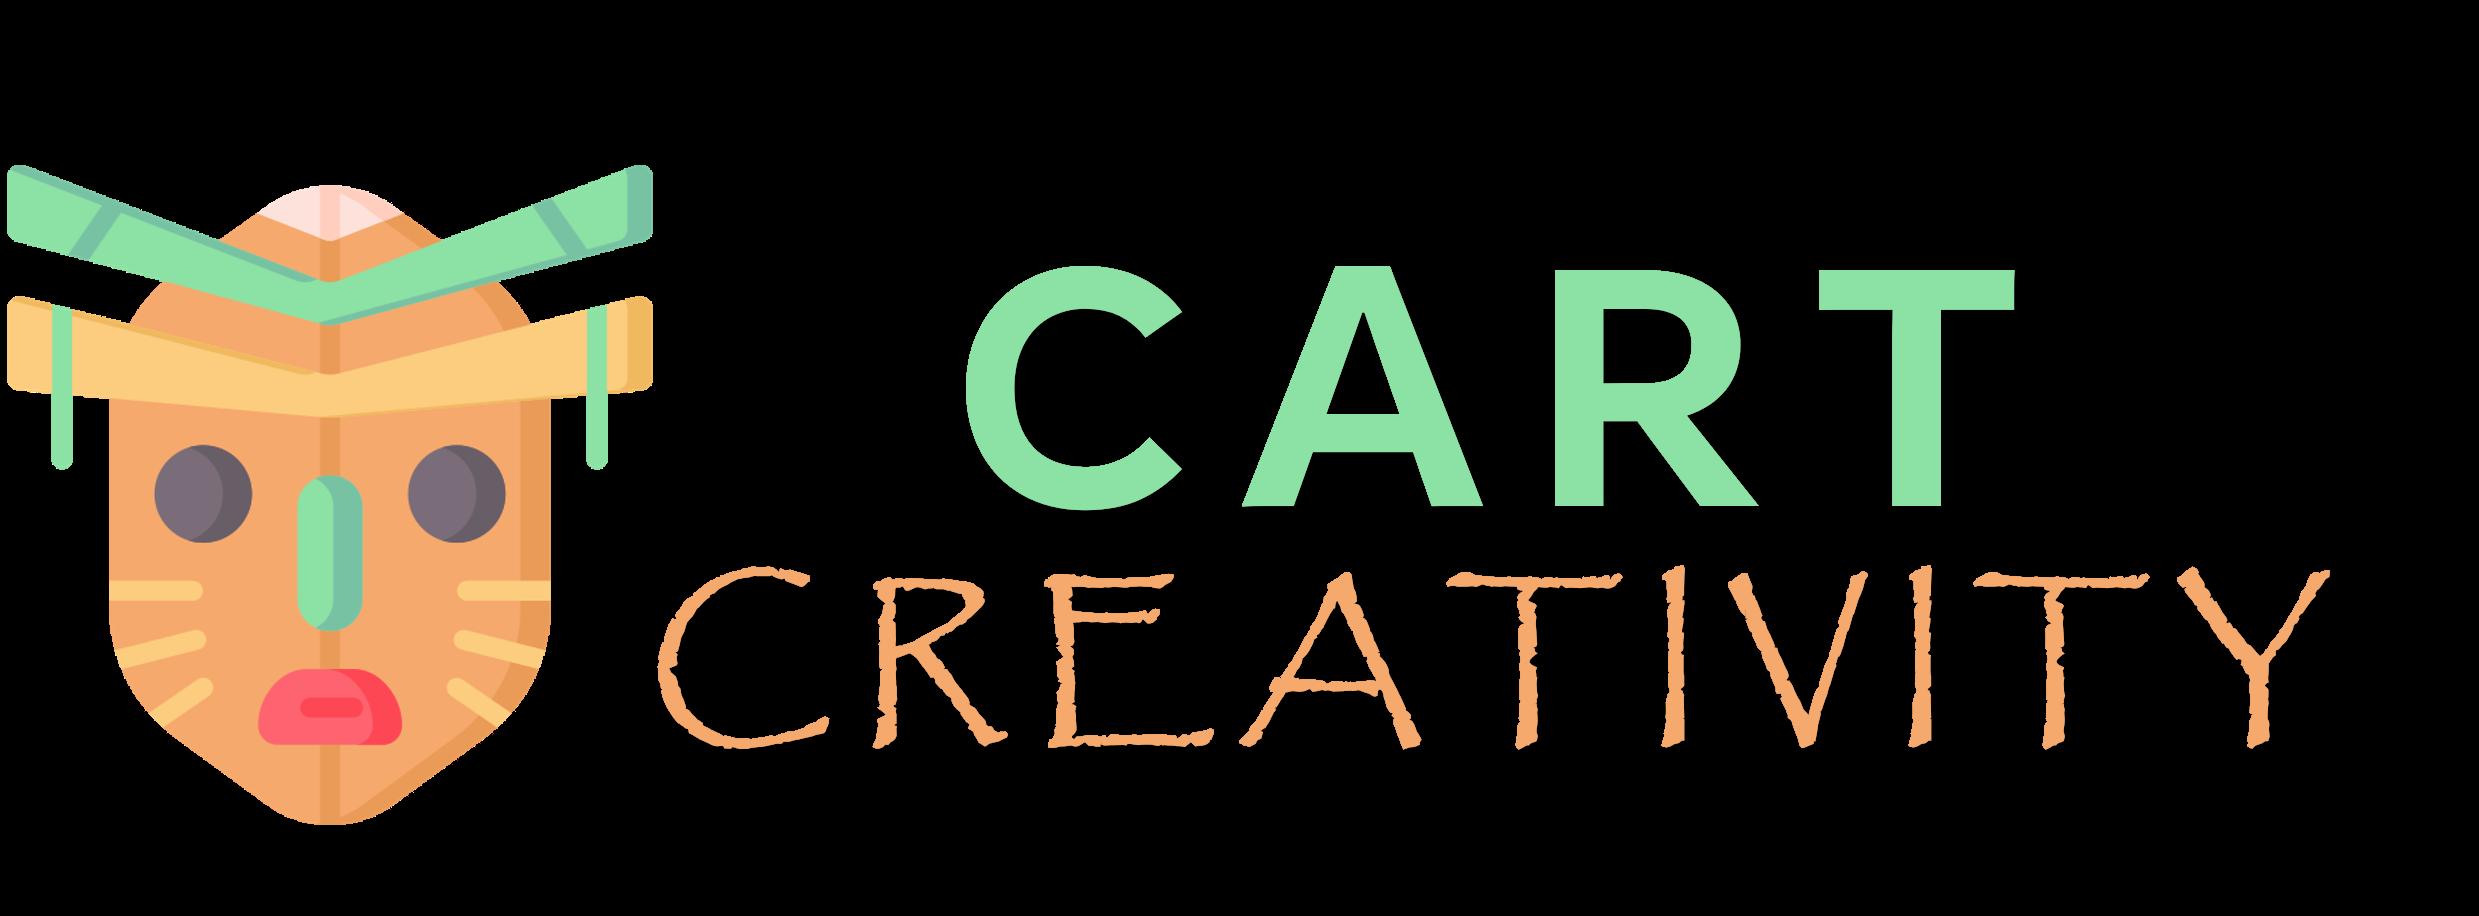 Cart Creativity